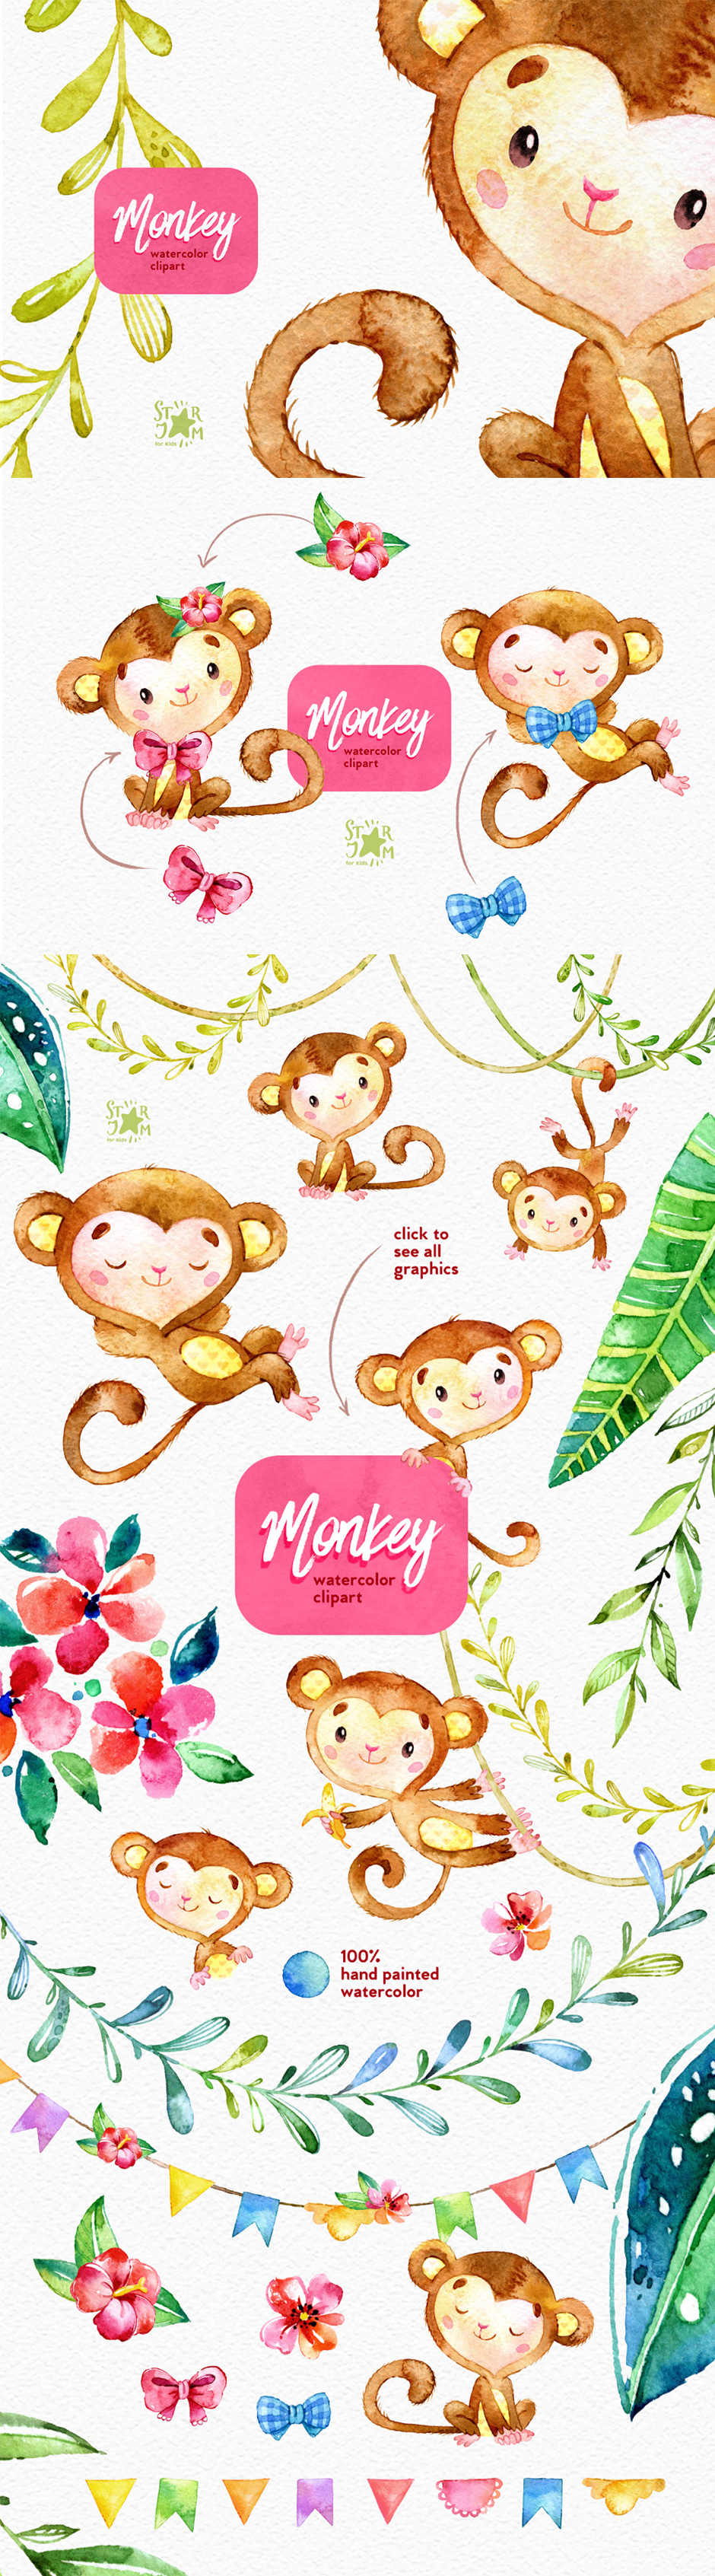 940x3385 Monkey Watercolor Clip Art